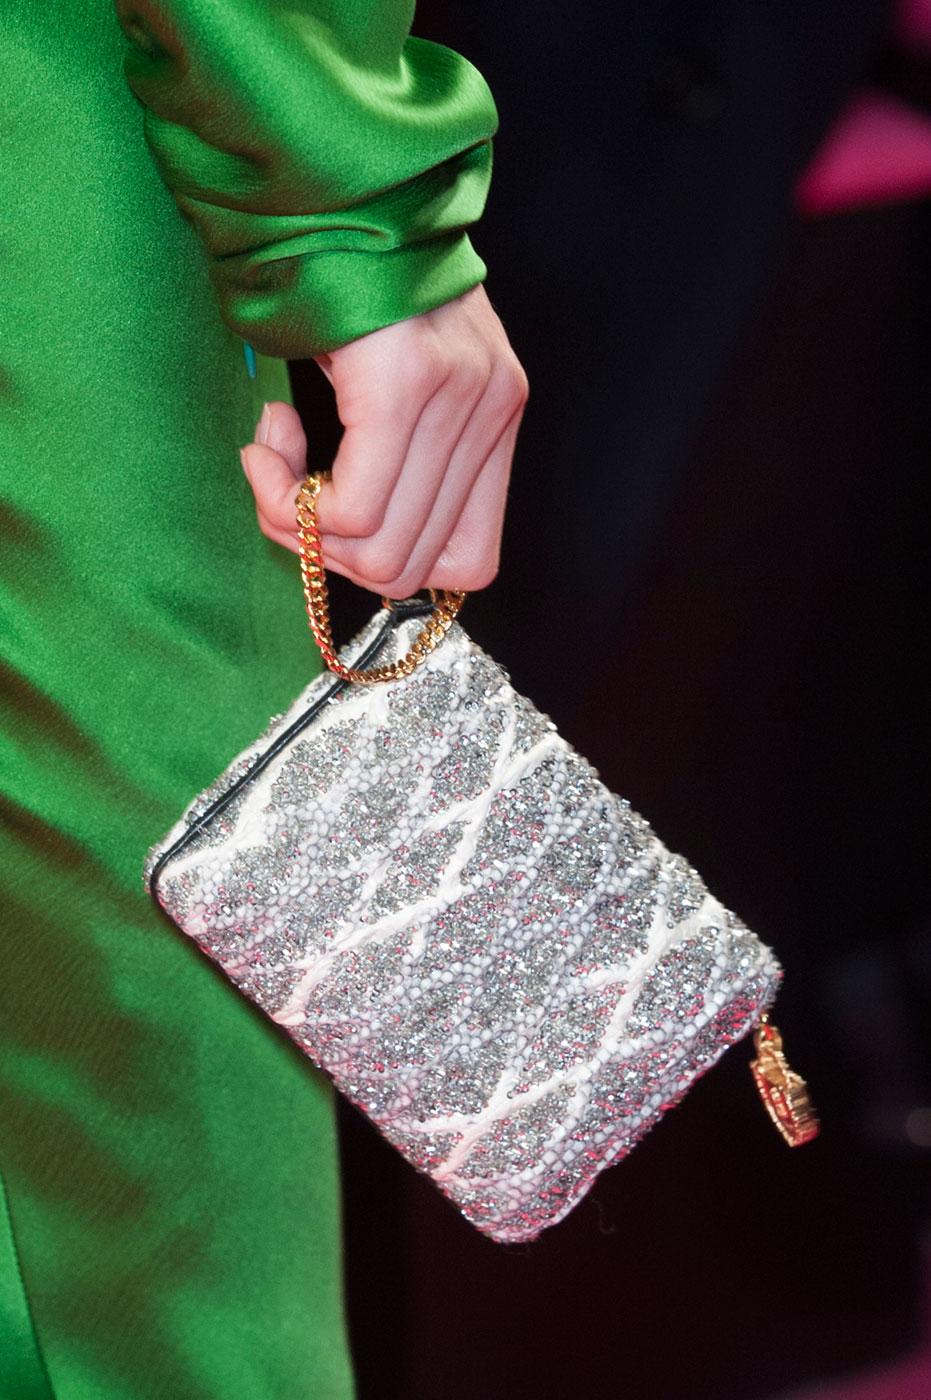 Schiaparelli-fashion-runway-show-close-ups-haute-couture-paris-spring-summer-2015-the-impression-21